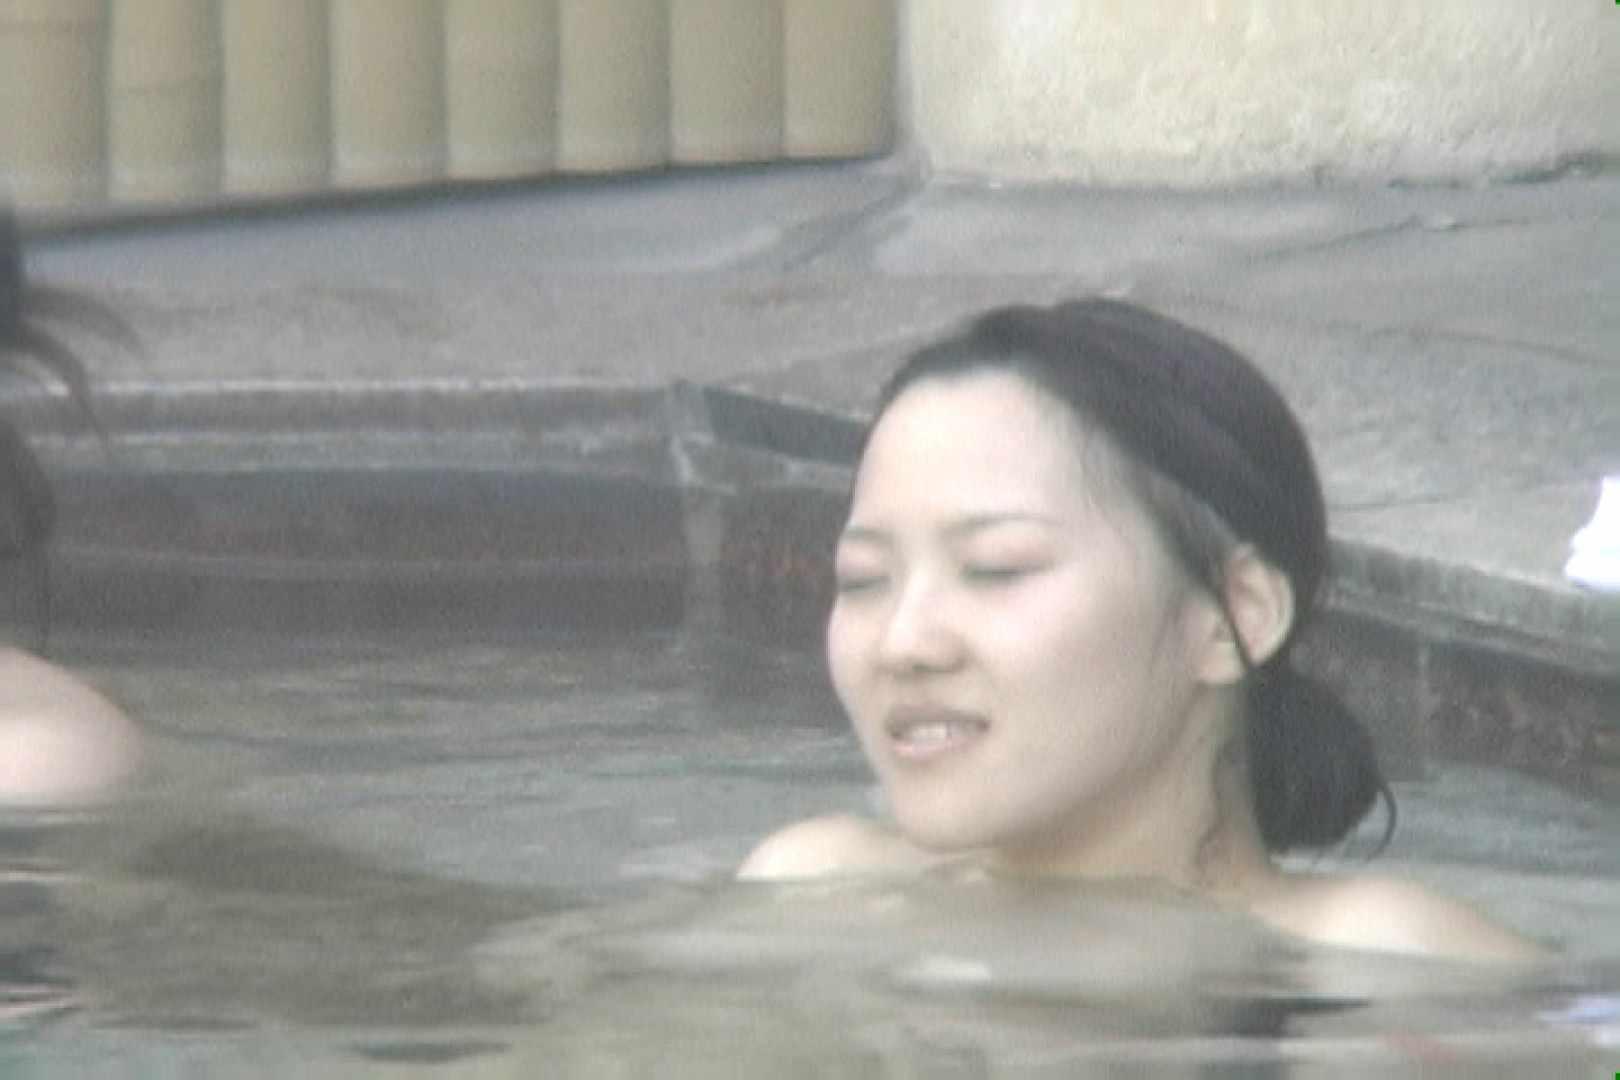 Aquaな露天風呂Vol.689 盗撮  50連発 27